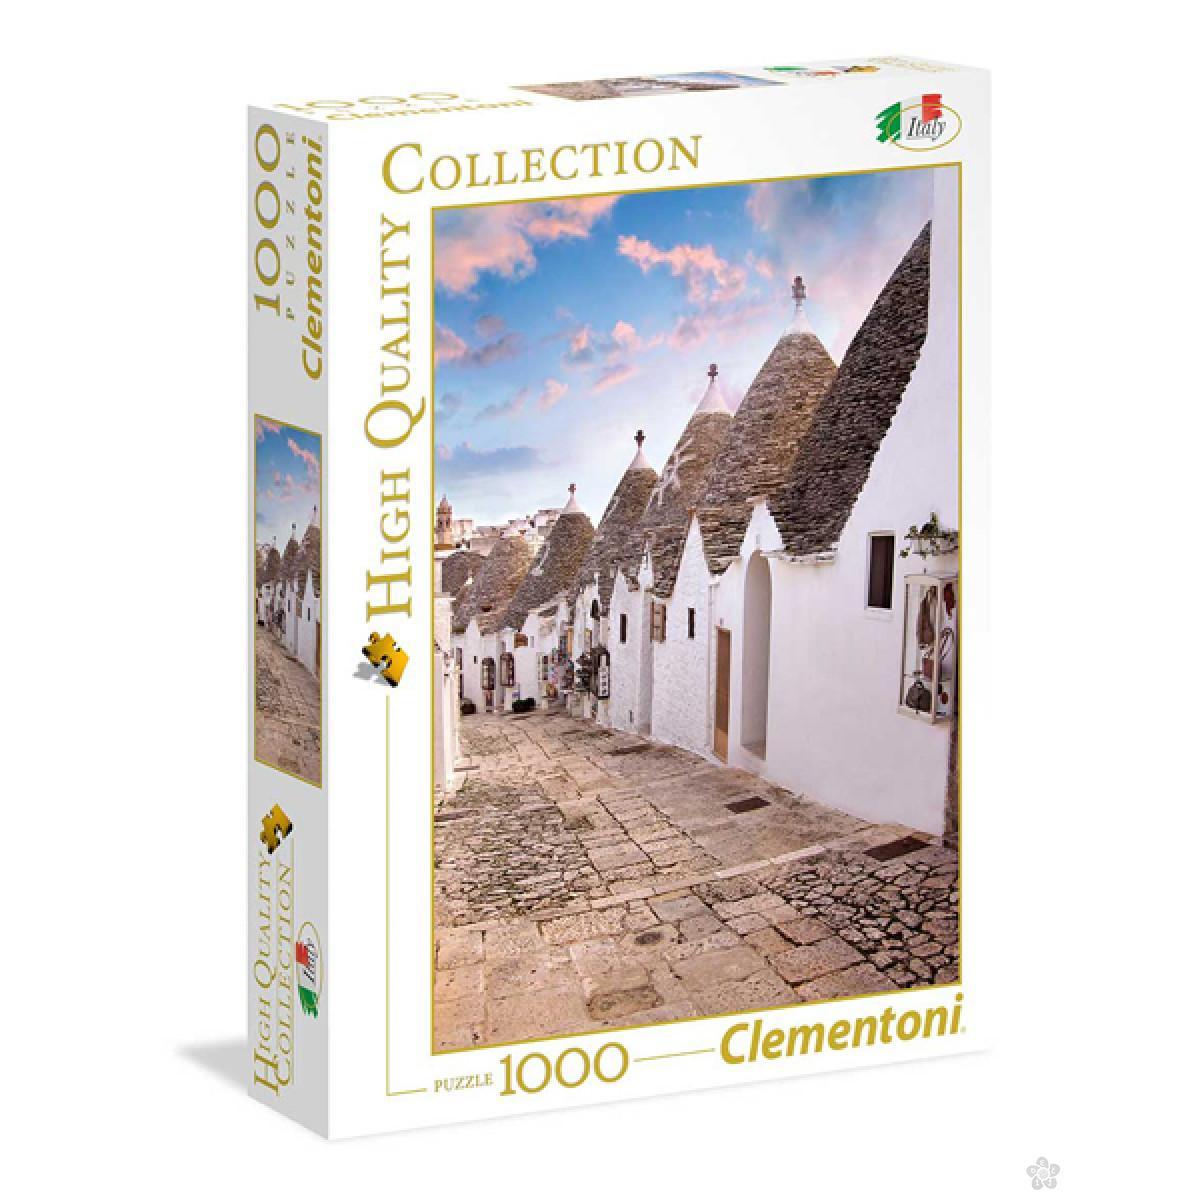 Clementoni puzzla Italian Collestion Alberobell 1000pcs 39450